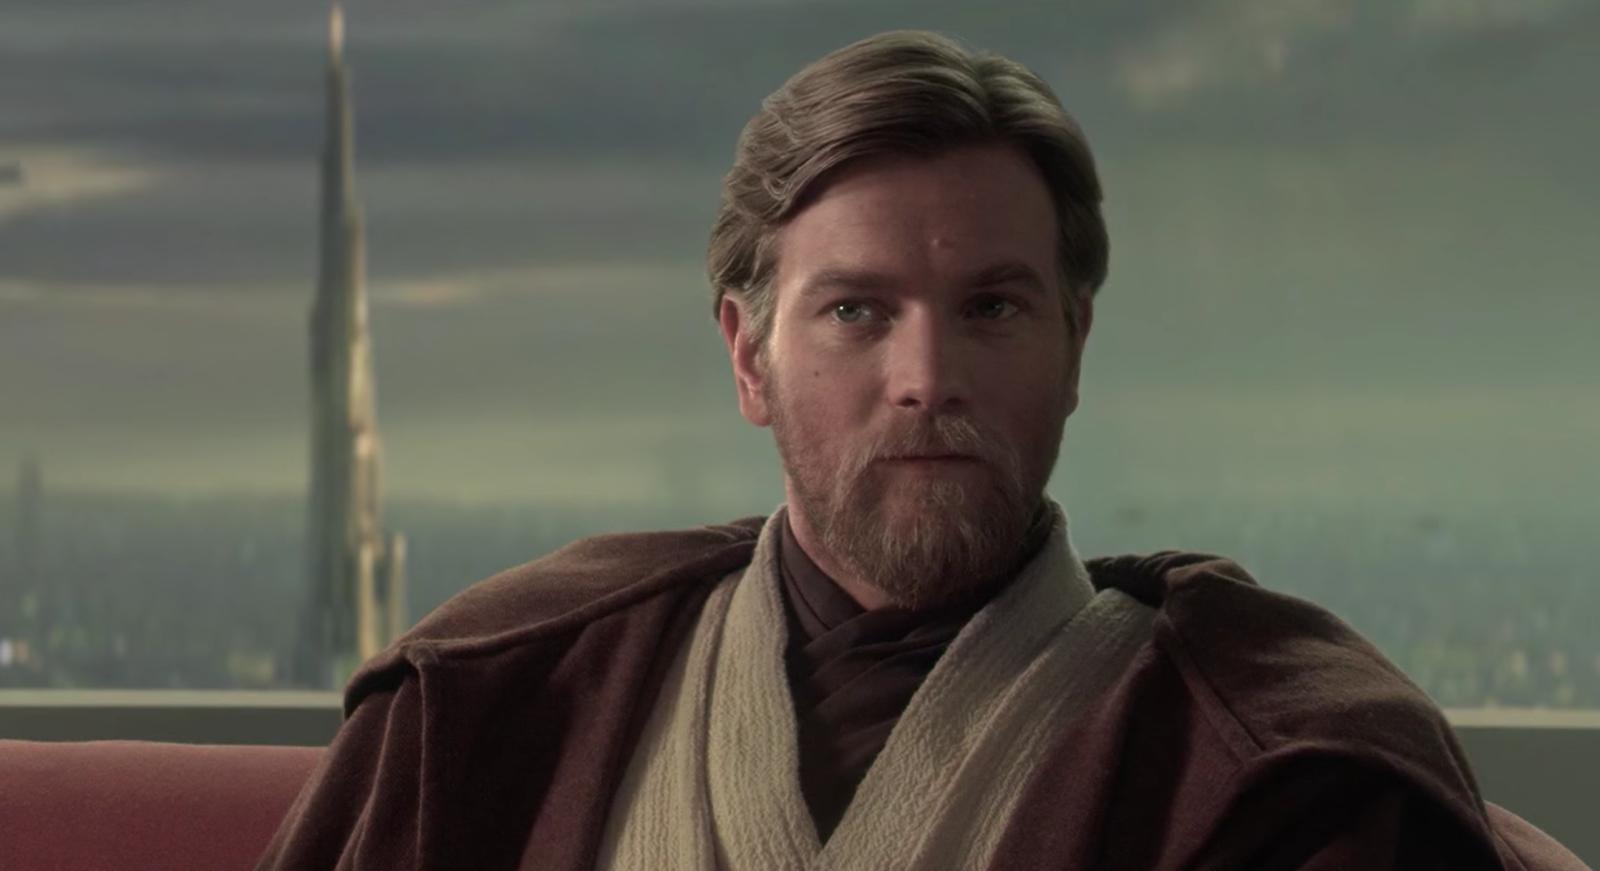 Director Deborah Chow And Writer Hossein Amini Join Obi-Wan Kenobi Series For Disney+